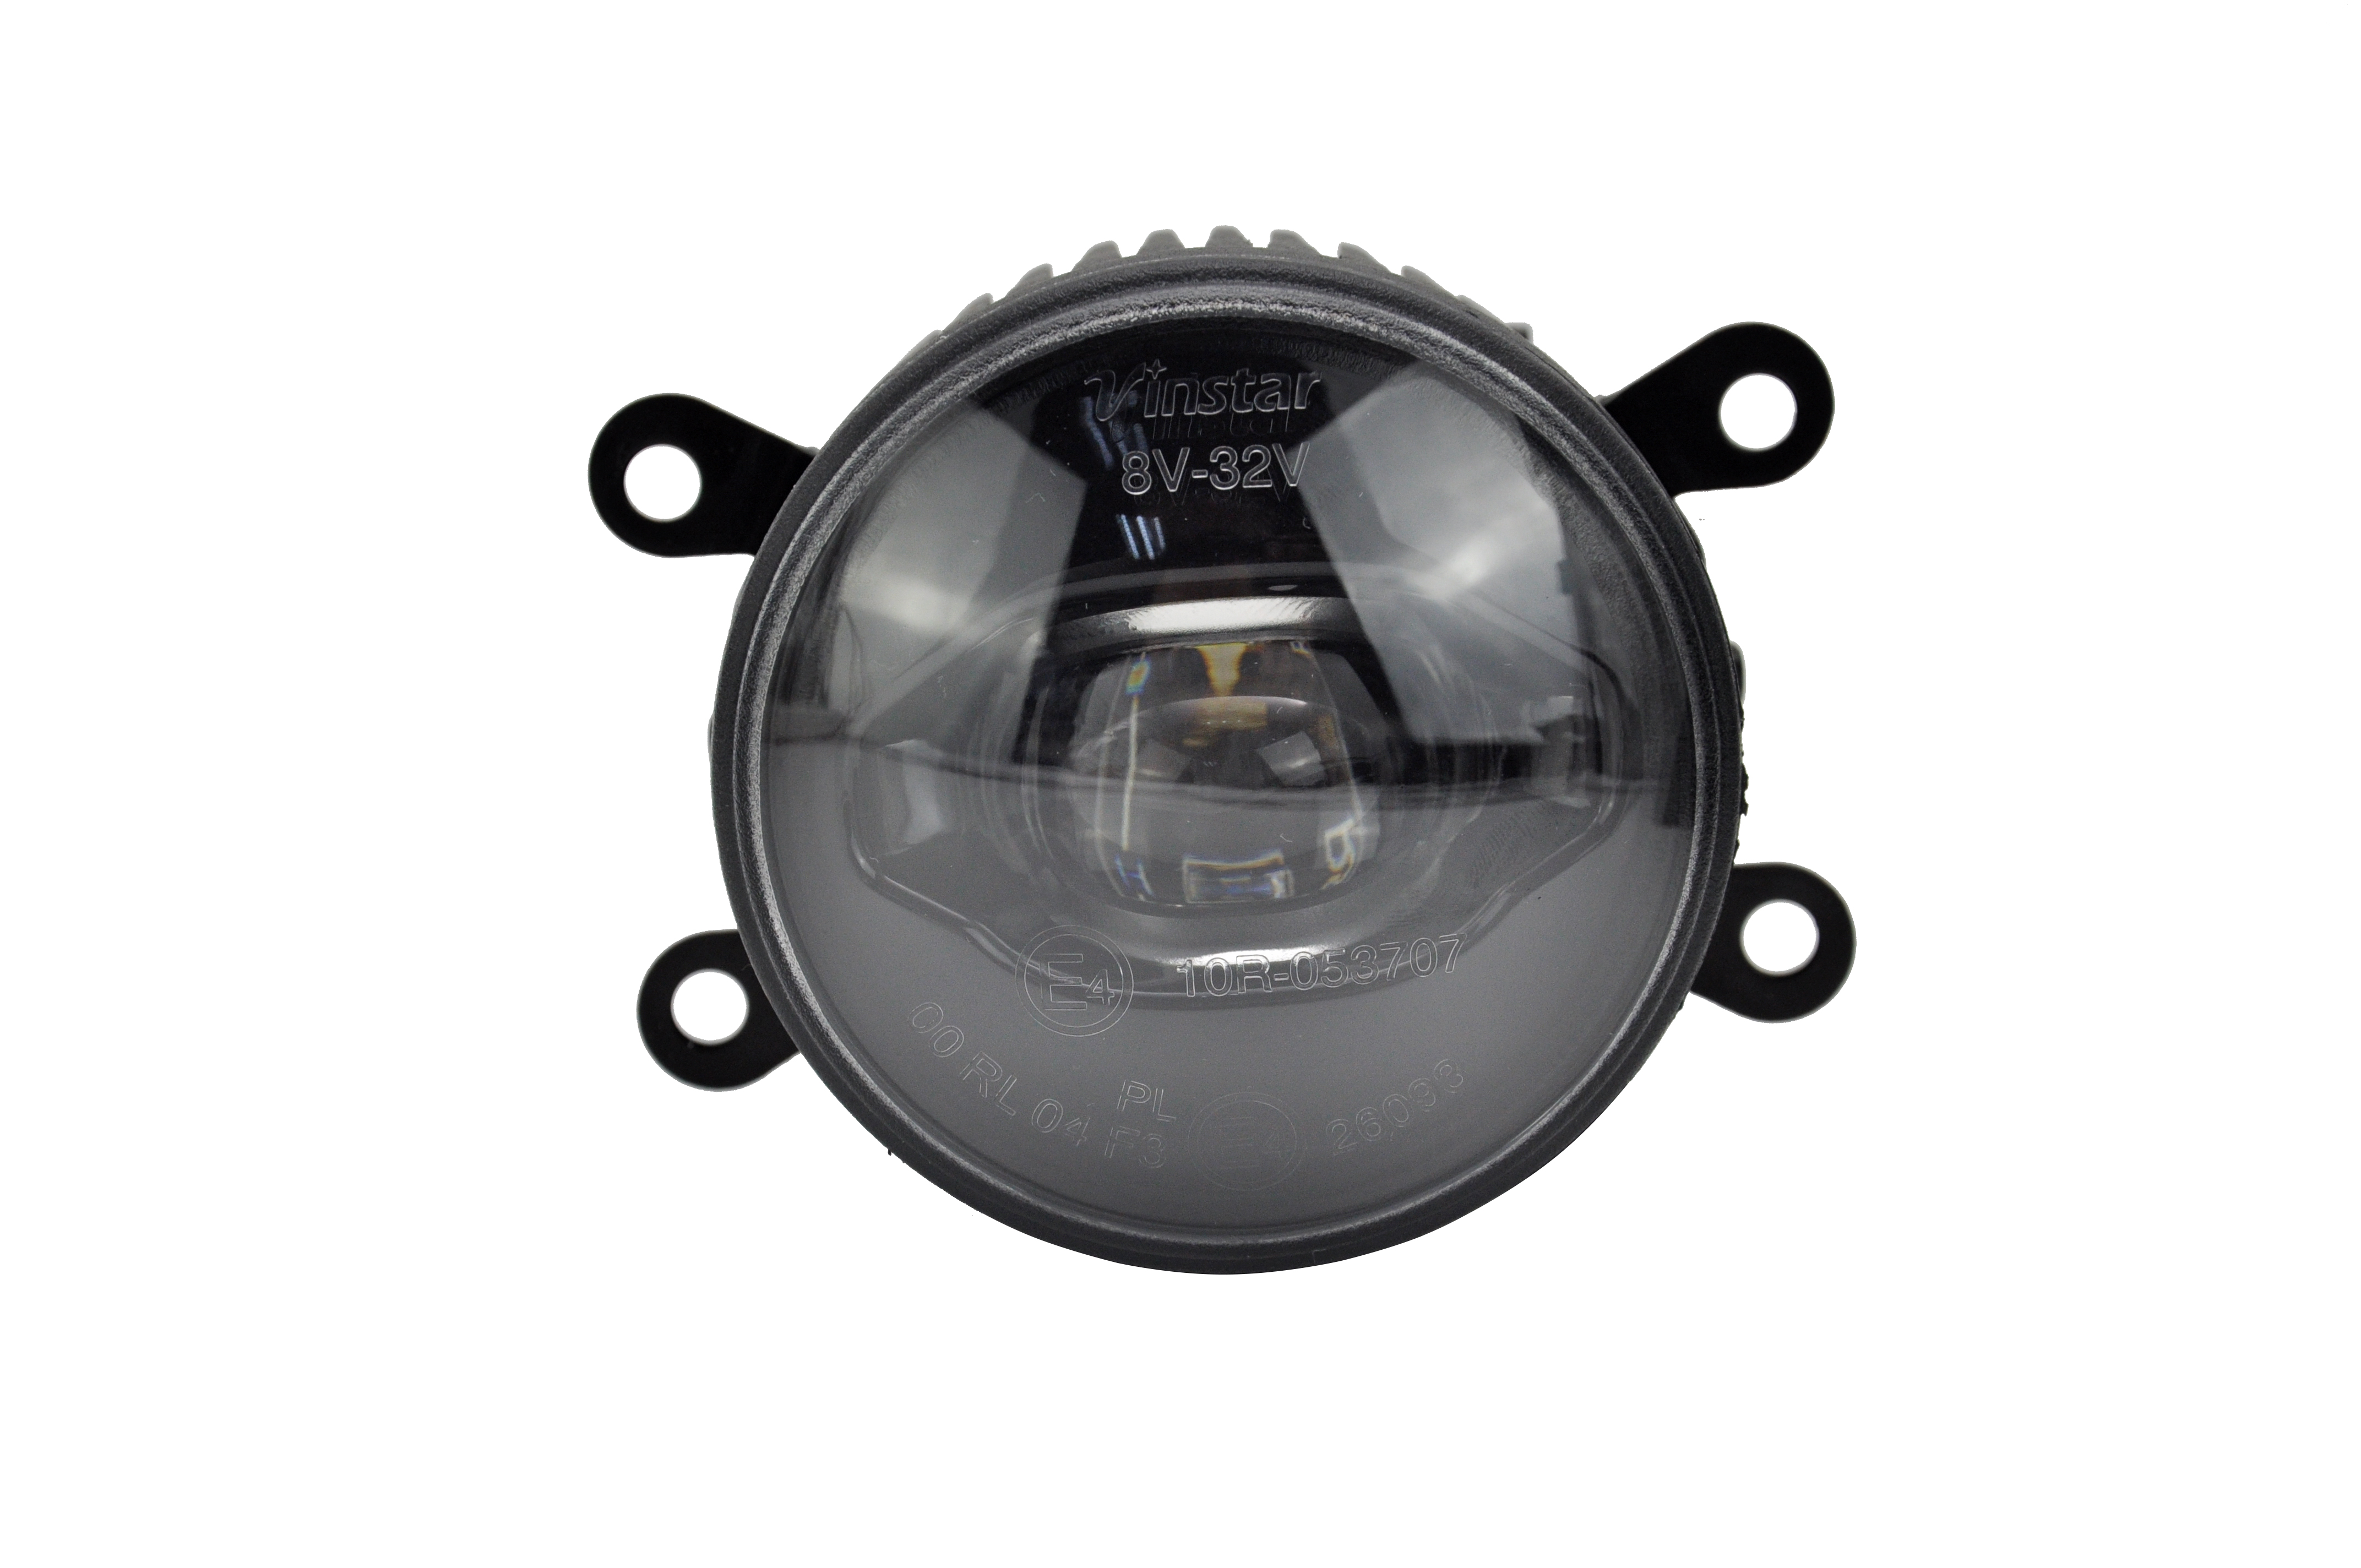 CITROEN XSARA PICASSO 2005-2010 FRONT FOG LIGHT LAMP DRIVERS SIDE